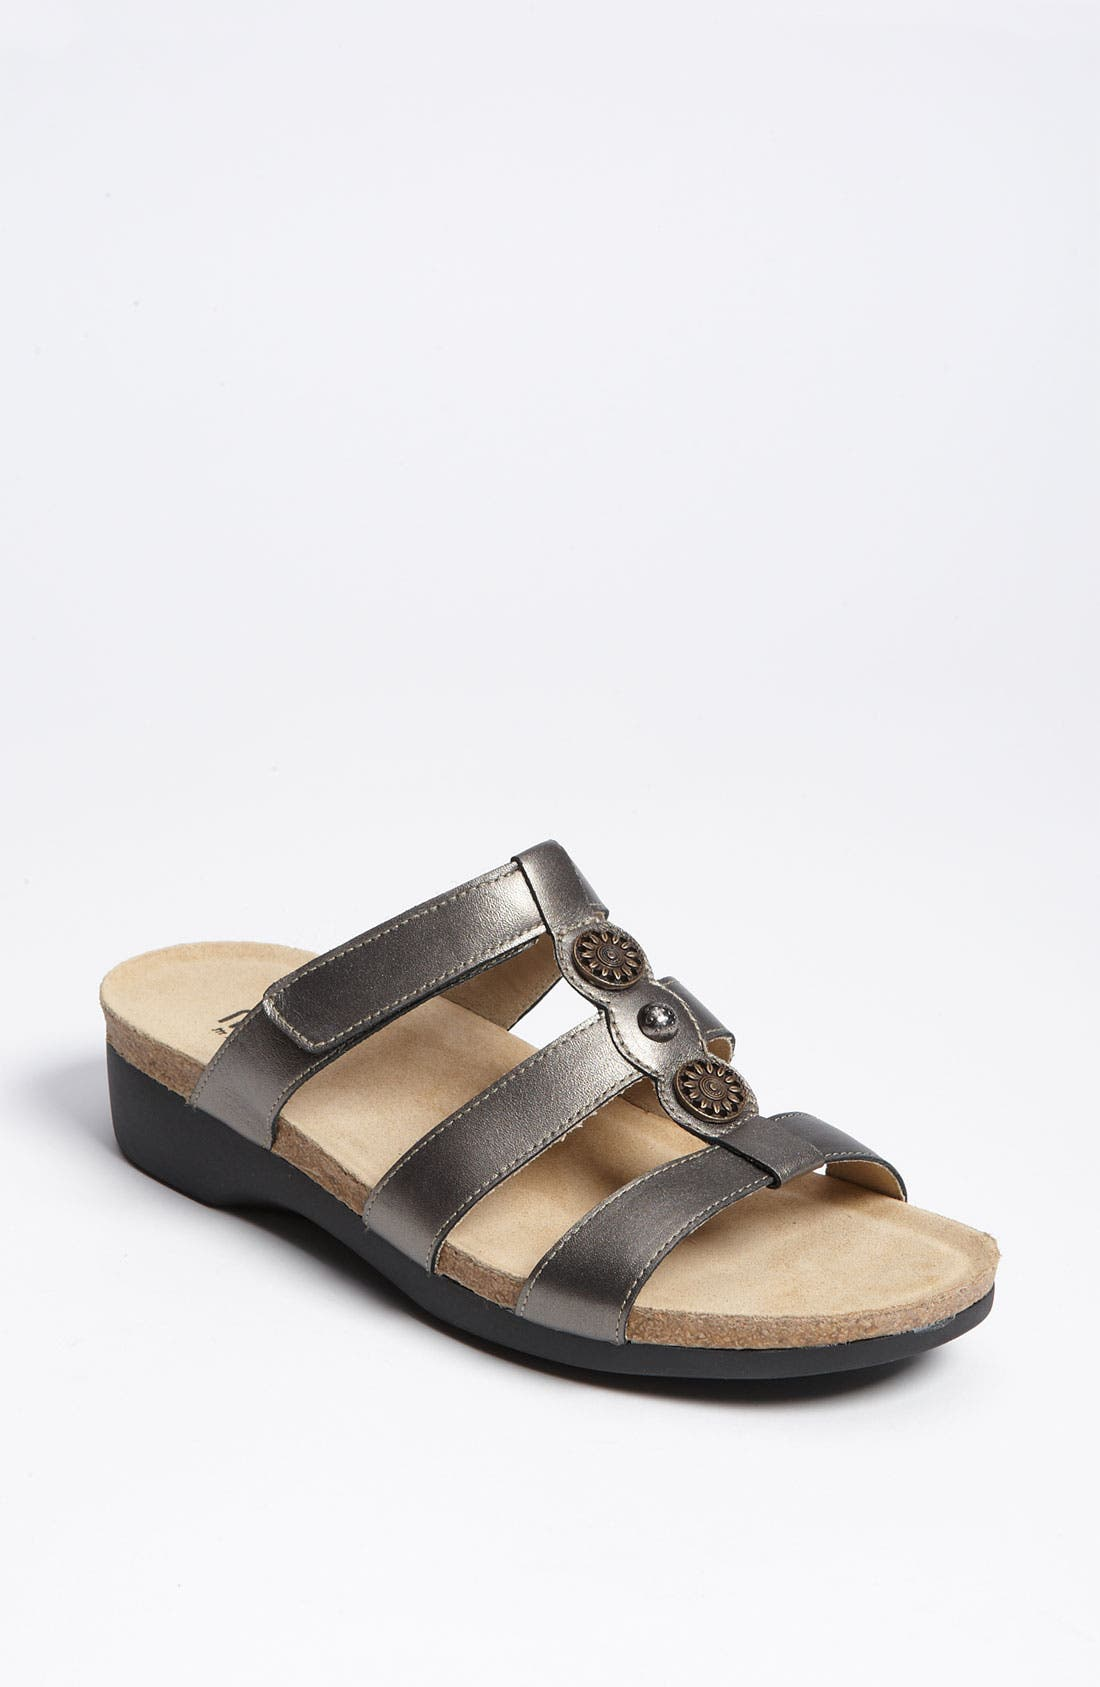 Alternate Image 1 Selected - Munro 'Virgo' Sandal